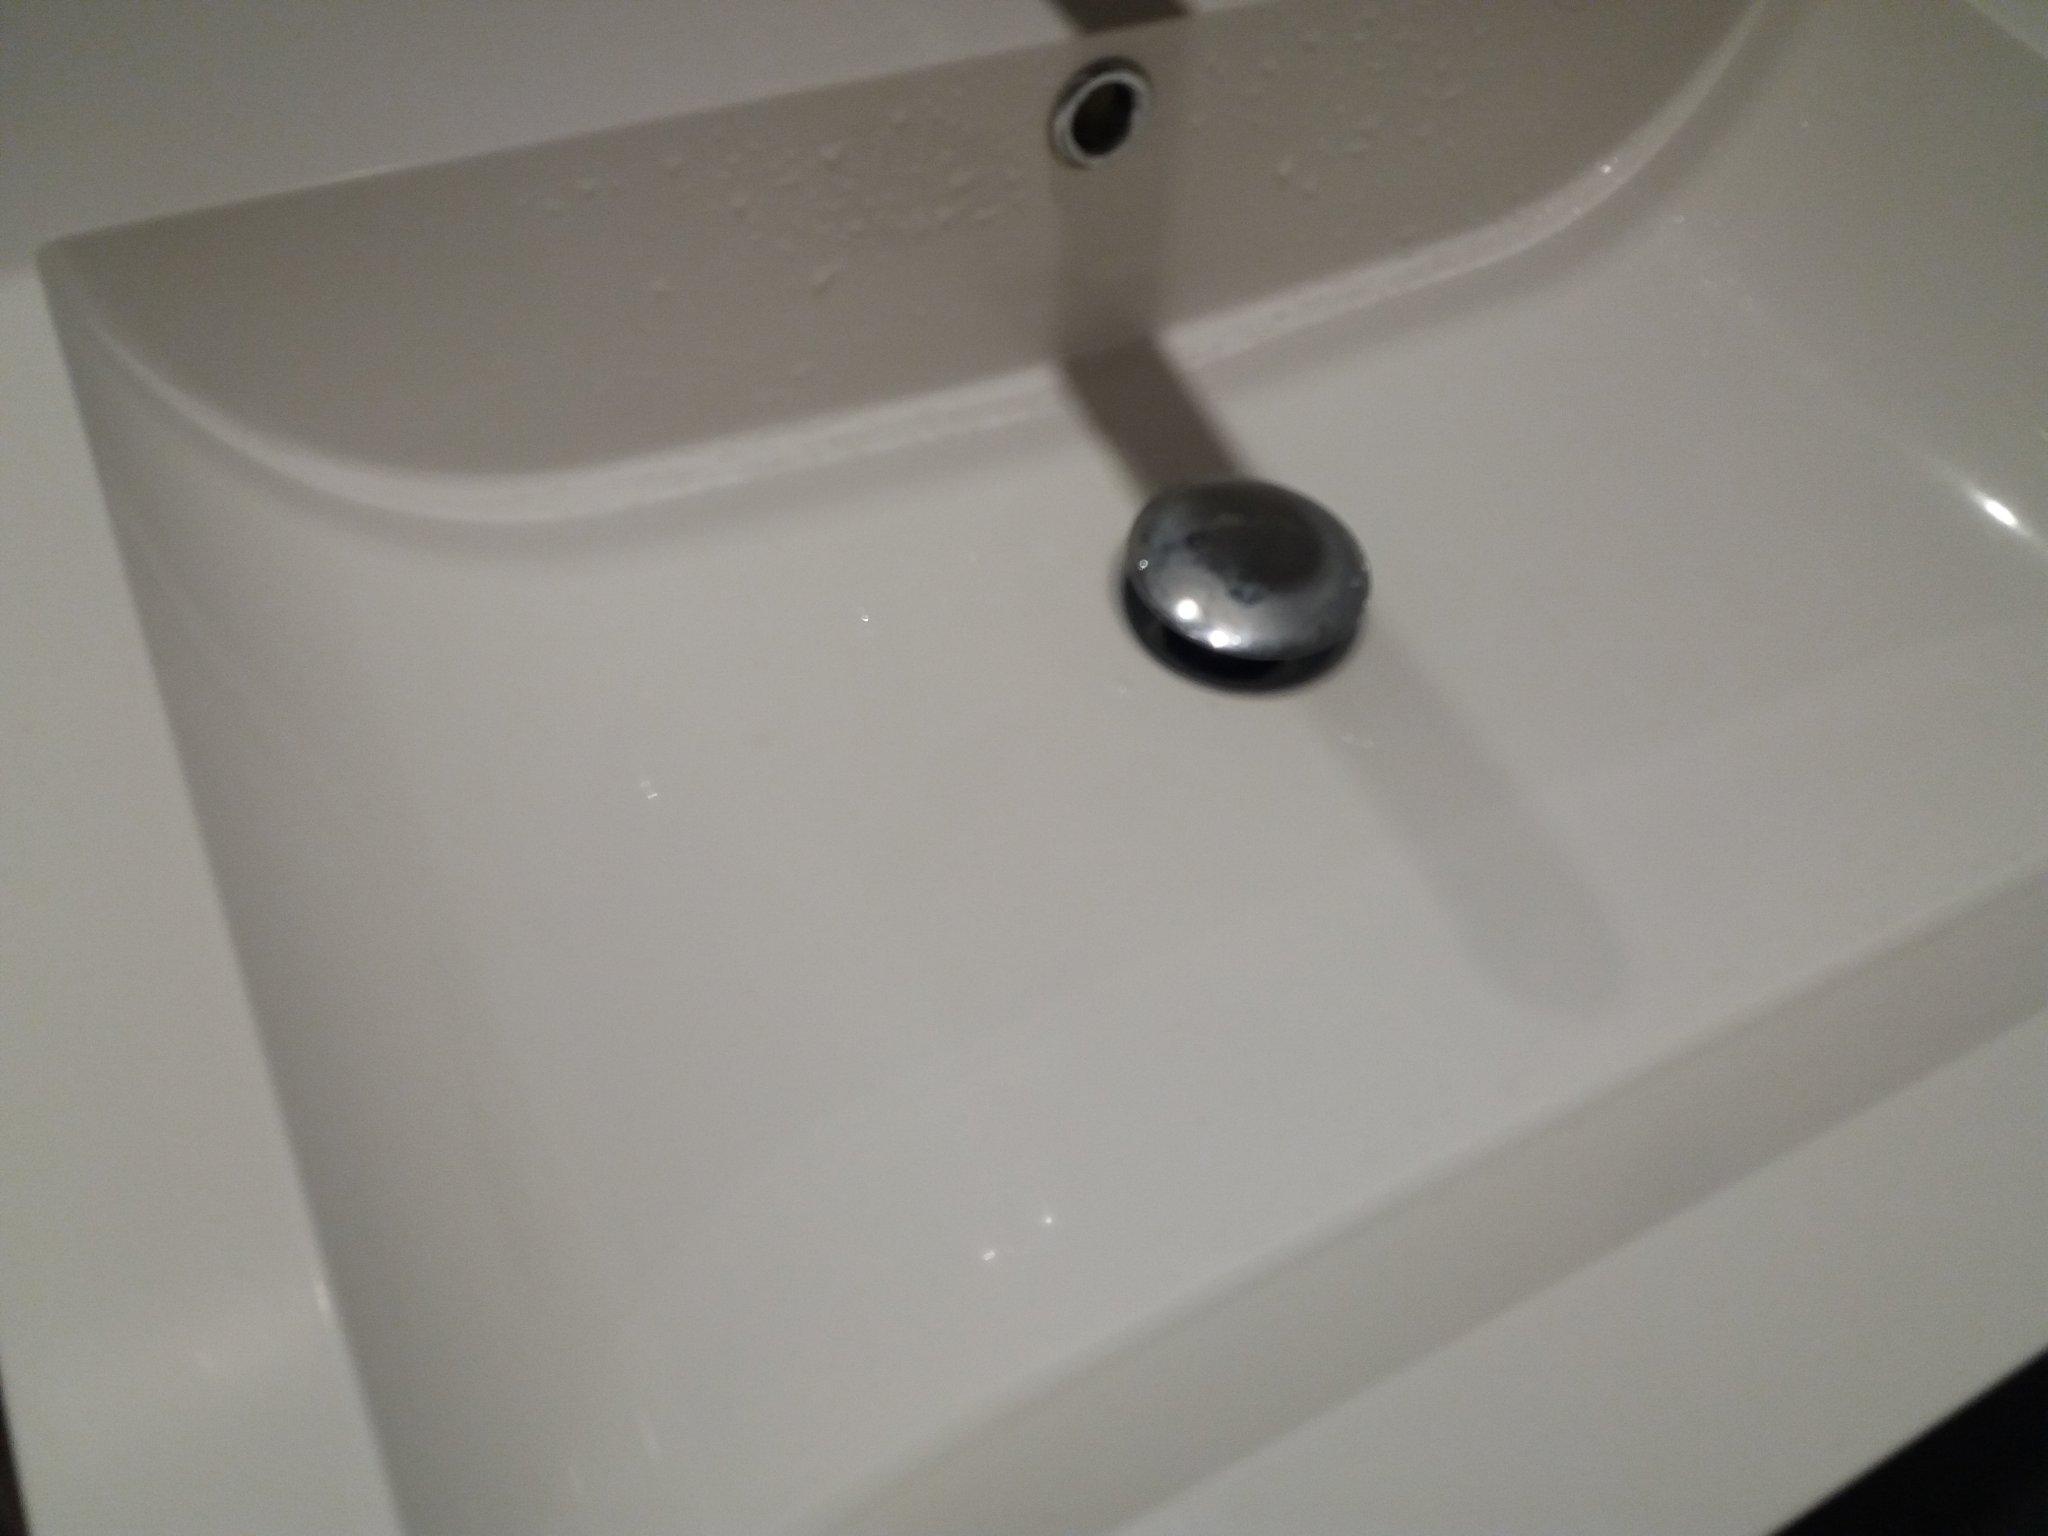 Badkamer Wastafel Afvoer : Badkamer kraan afvoer fonteinset differnz helios